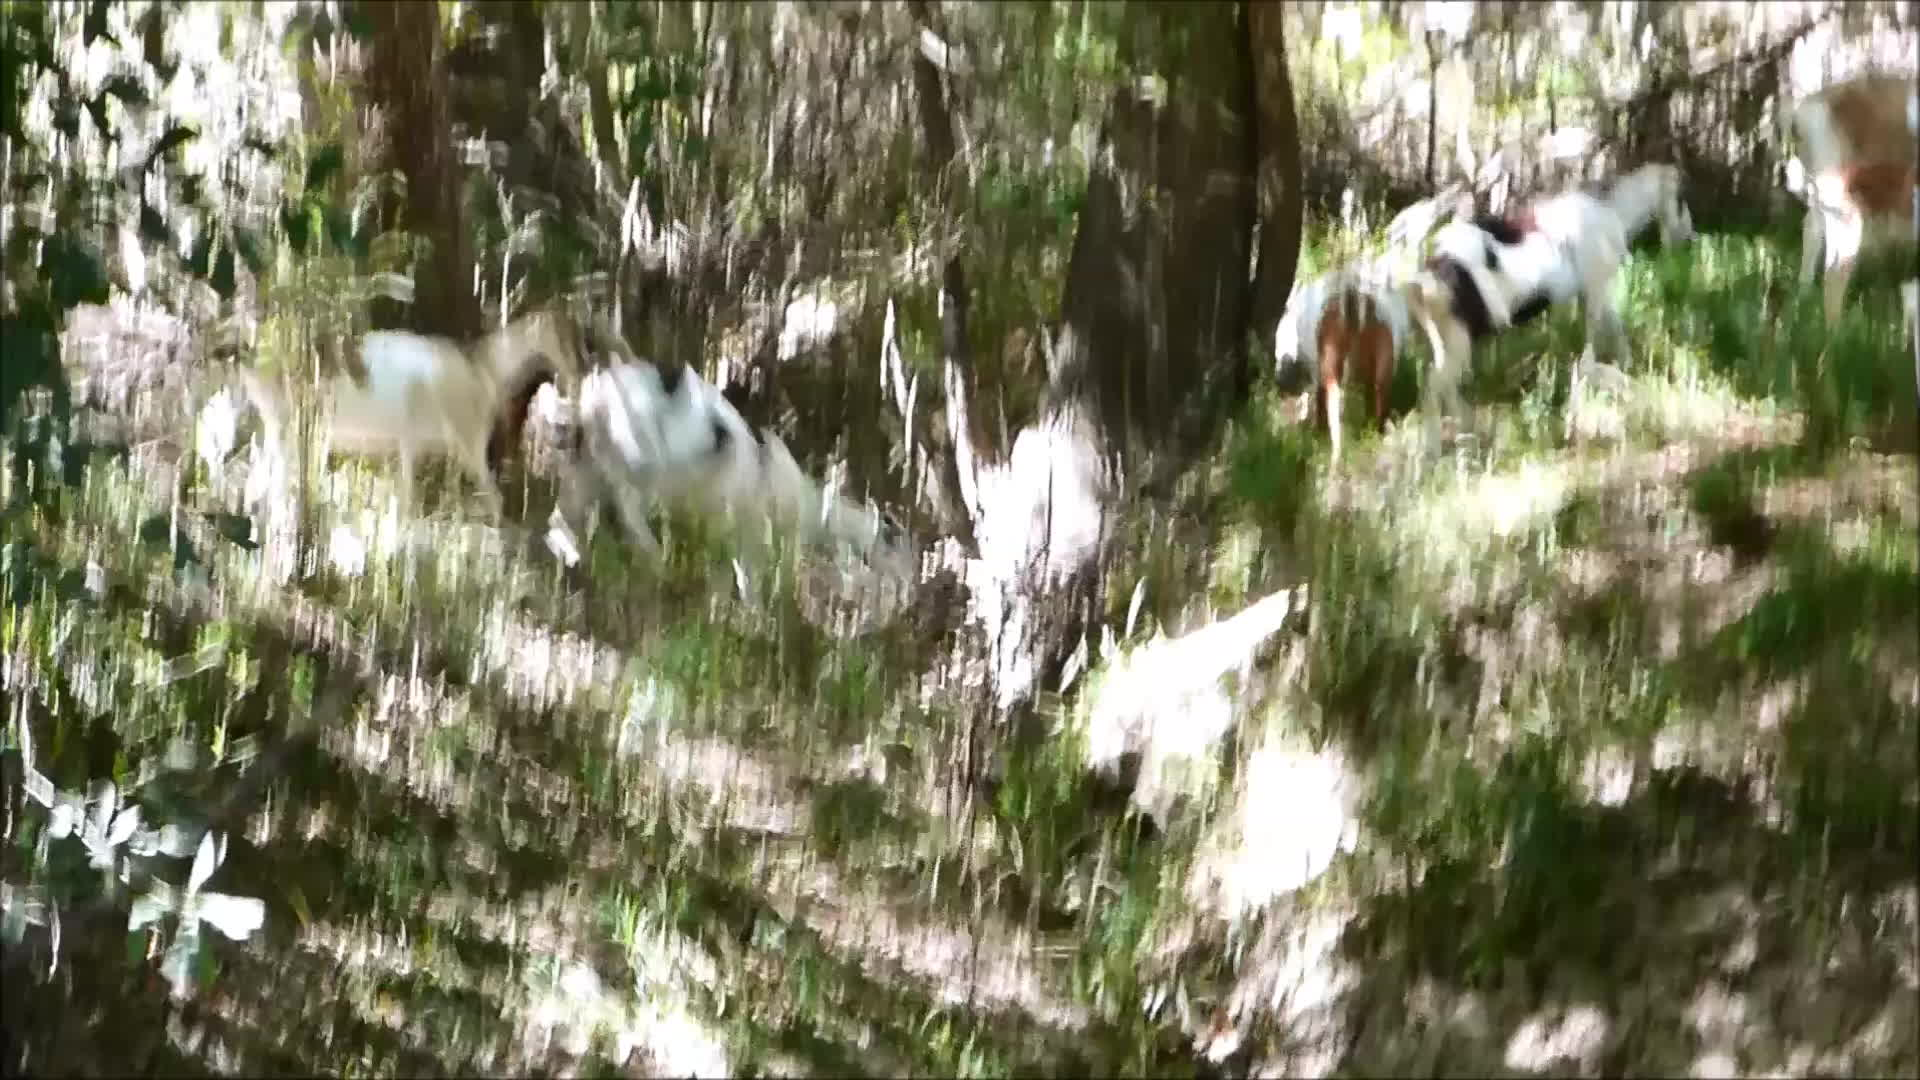 Goatparkour, goats, jump, knsfarm, Making the Jump GIFs